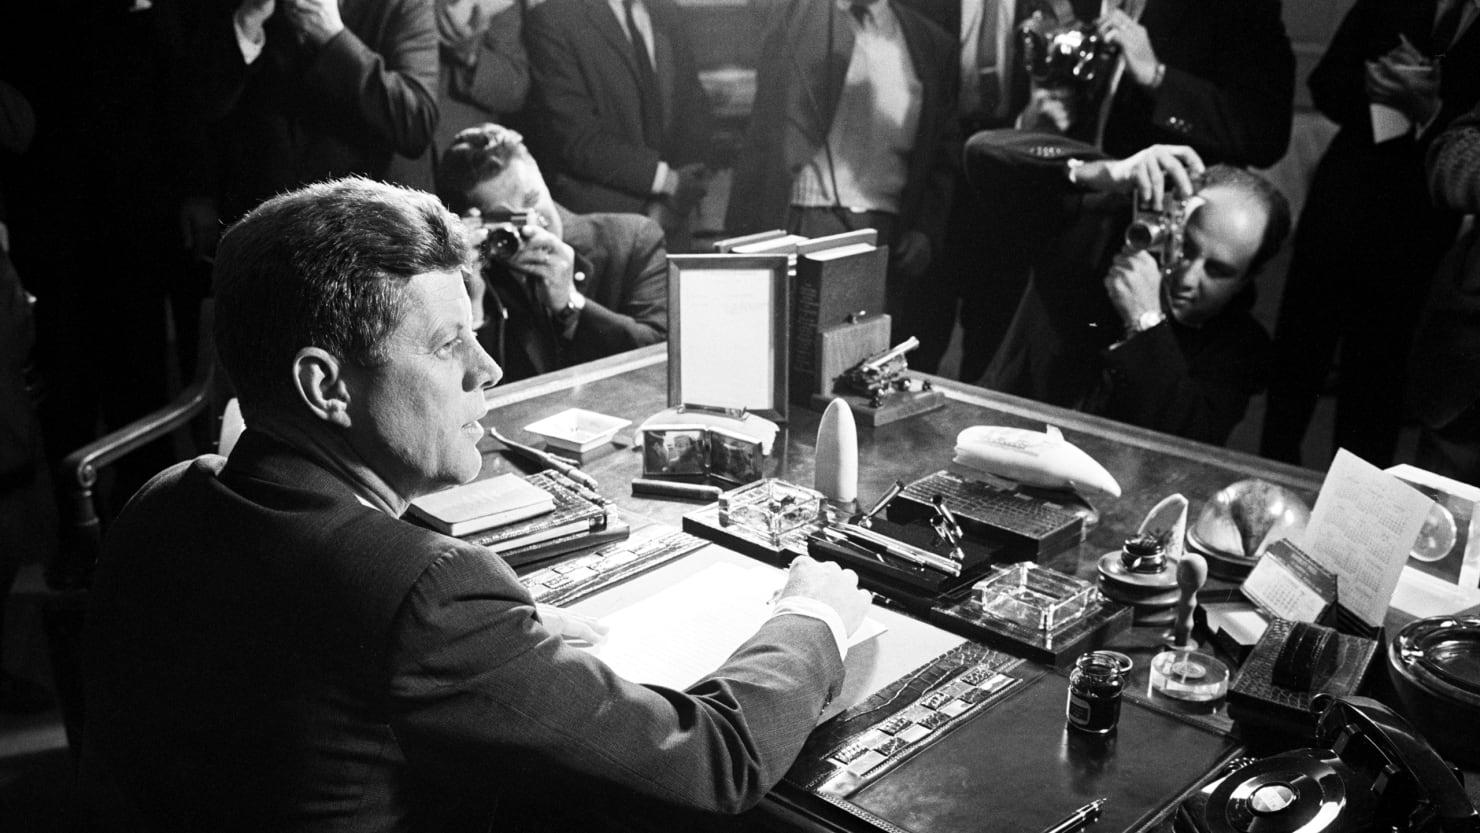 When Journalists Decried JFK's 'Lies' and Fake News Cries